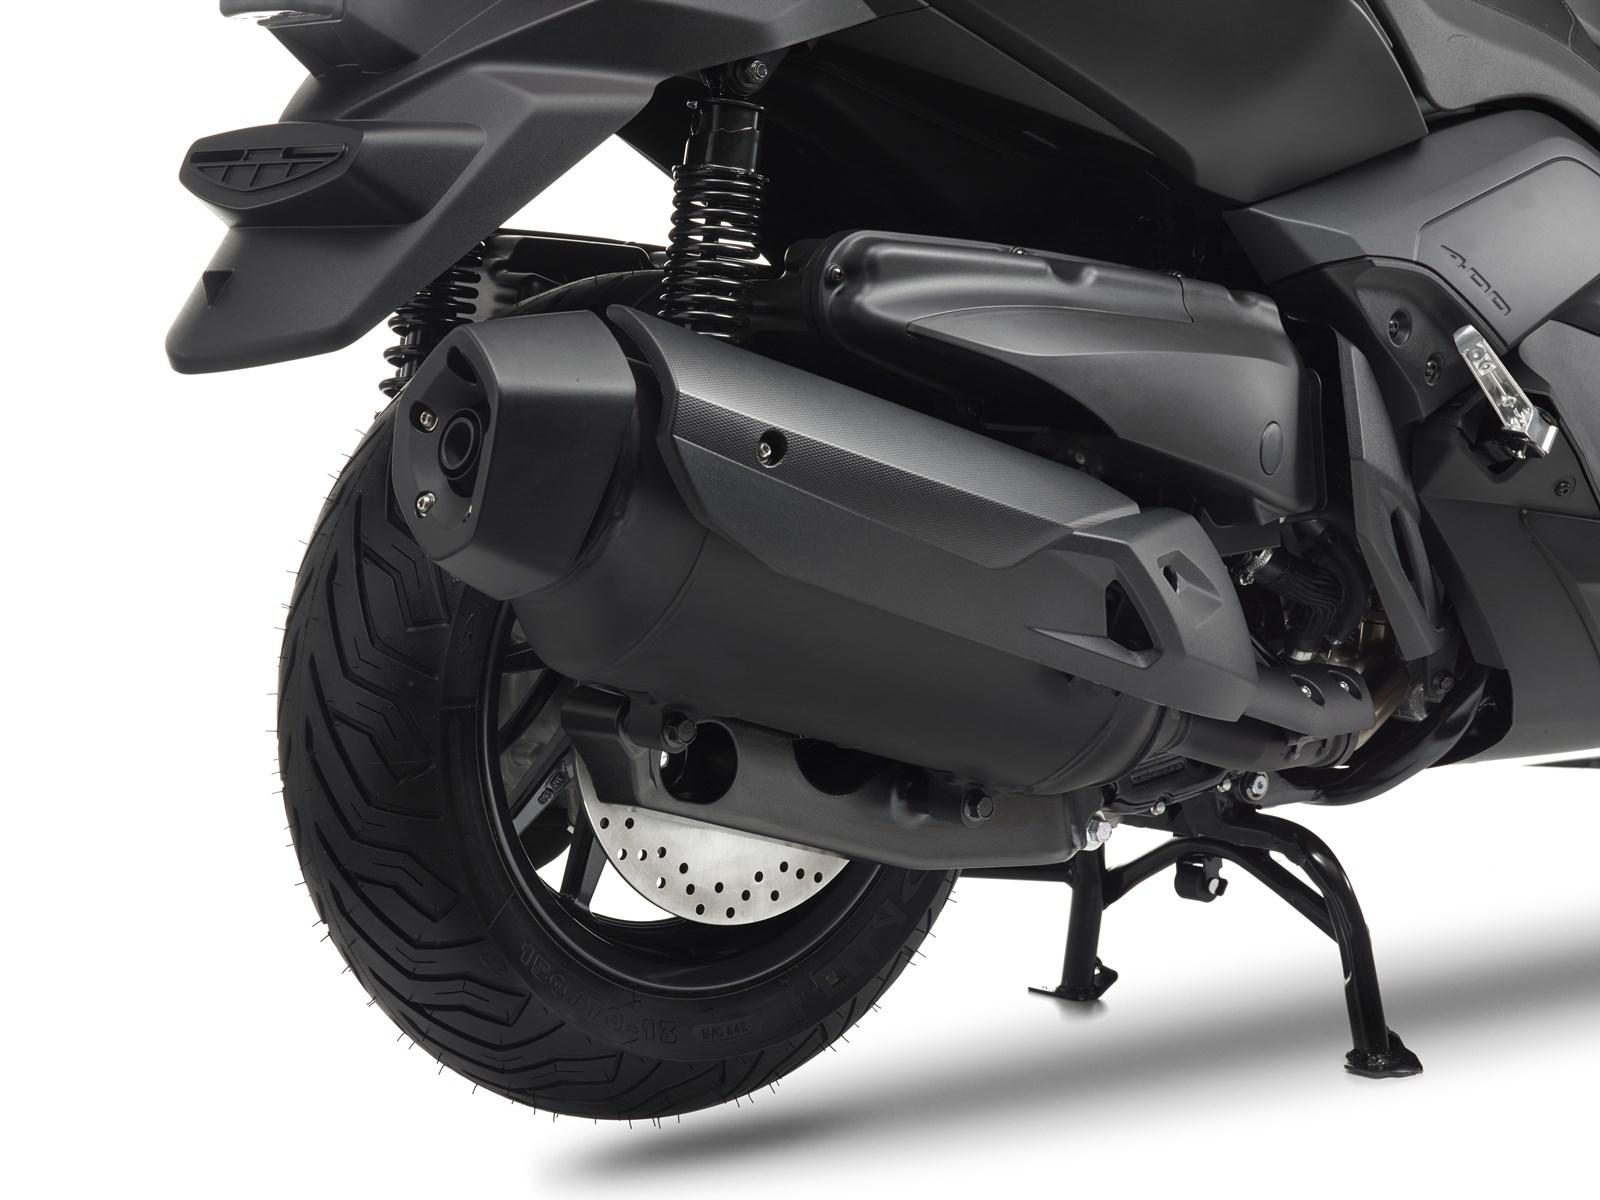 Foto de Yamaha X-MAX 400 MOMODESIGN, estudio y detalles (25/33)